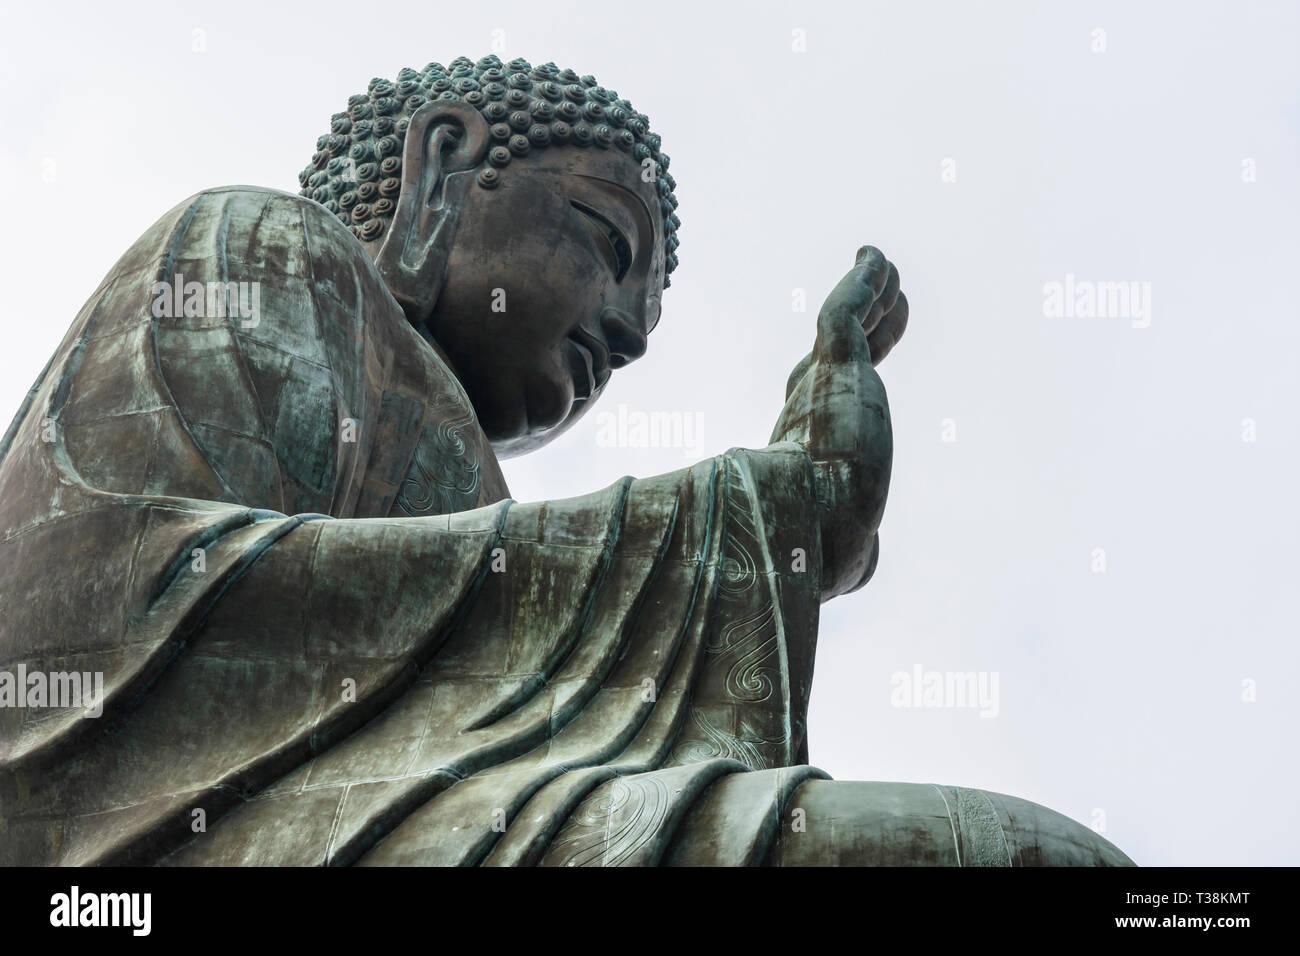 Large bronze Tian Tan Buddha, Lantau Island, Hong Kong - Stock Image